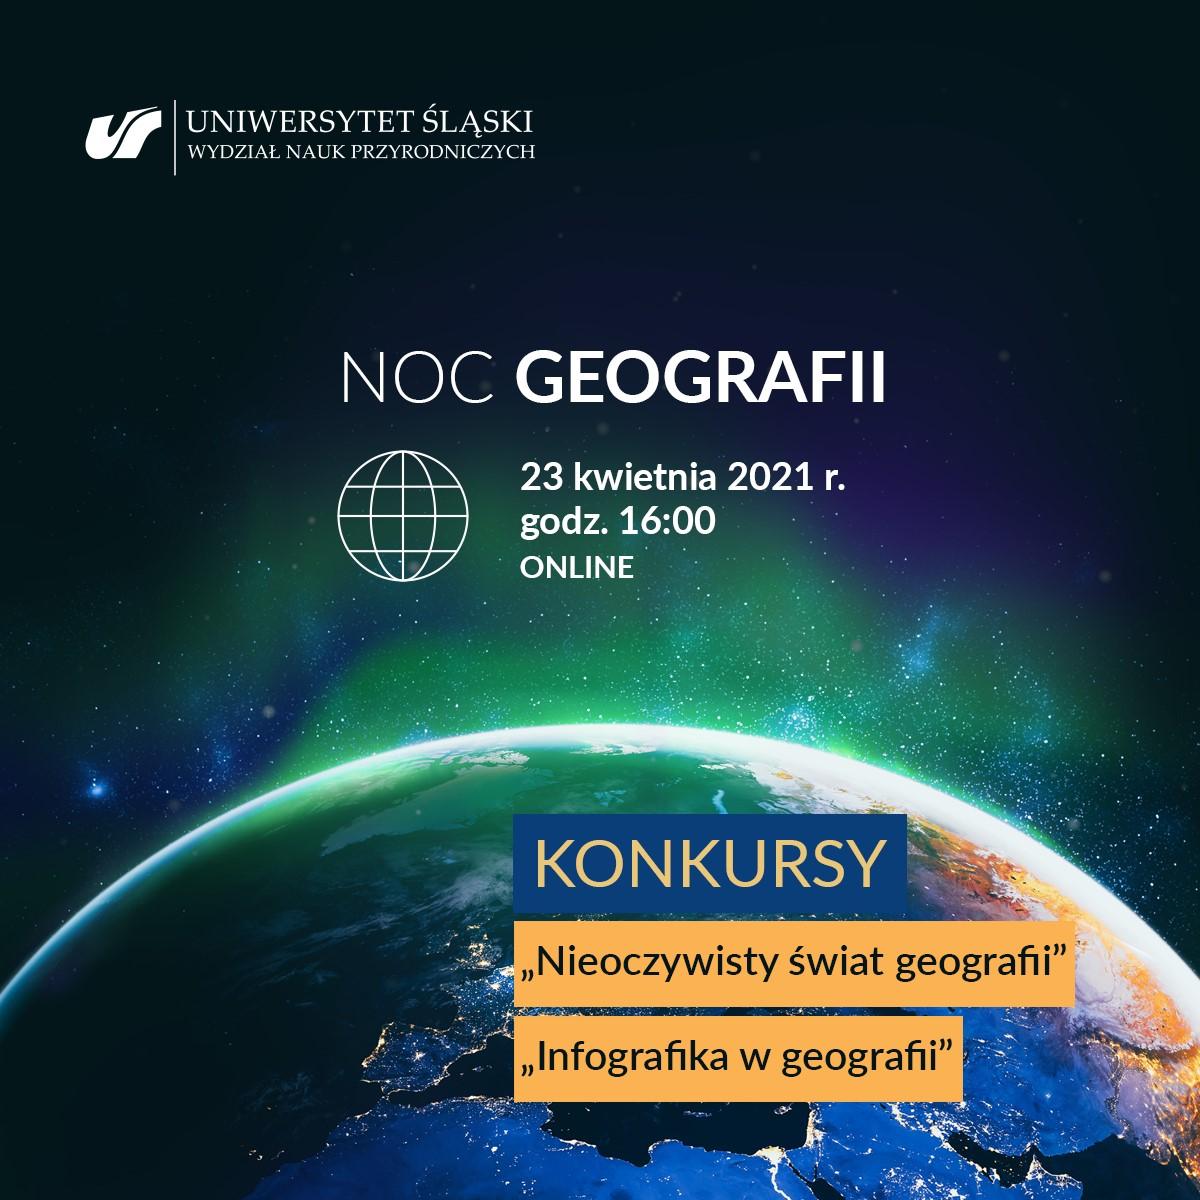 Plakat NOC GEOGRAFII 2021